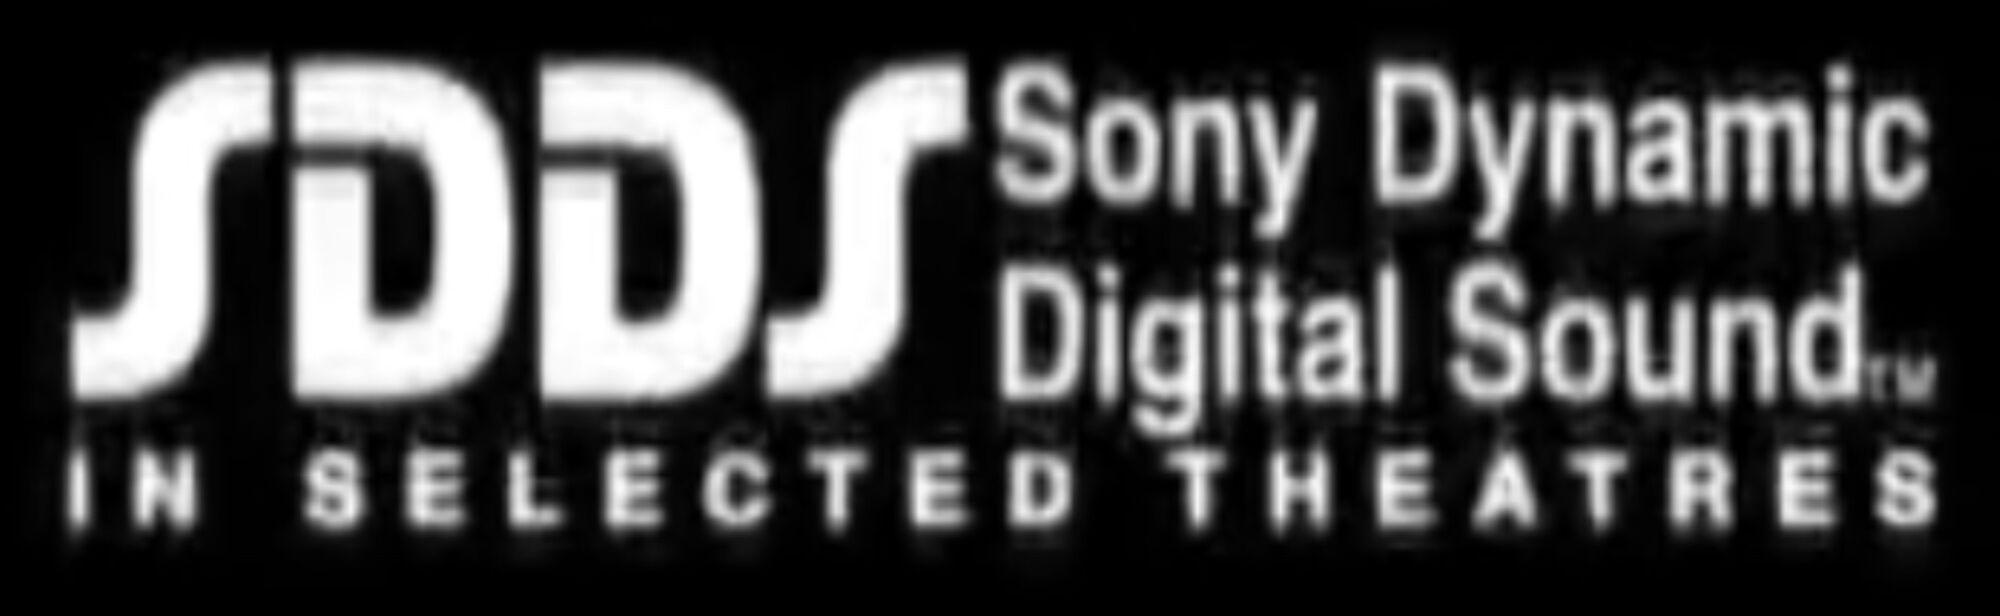 Sony Dynamic Digital Sound | Logopedia | FANDOM powered by ...